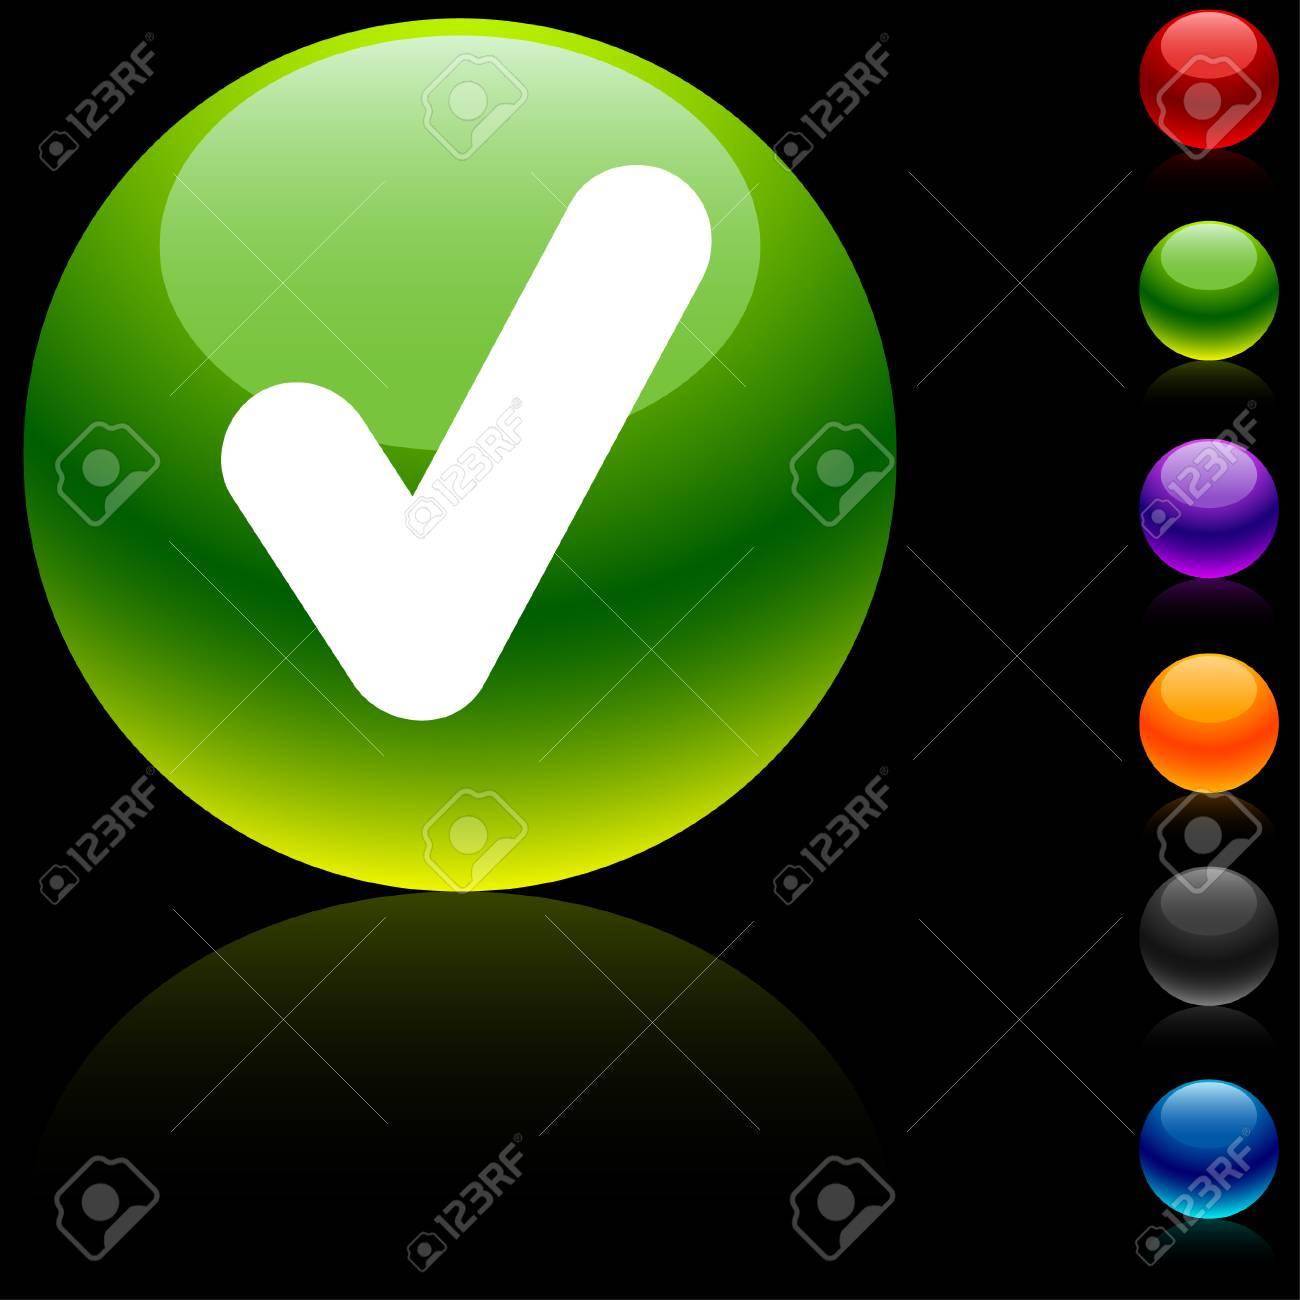 Check glossy icon. Vector illustration. Stock Vector - 5635419